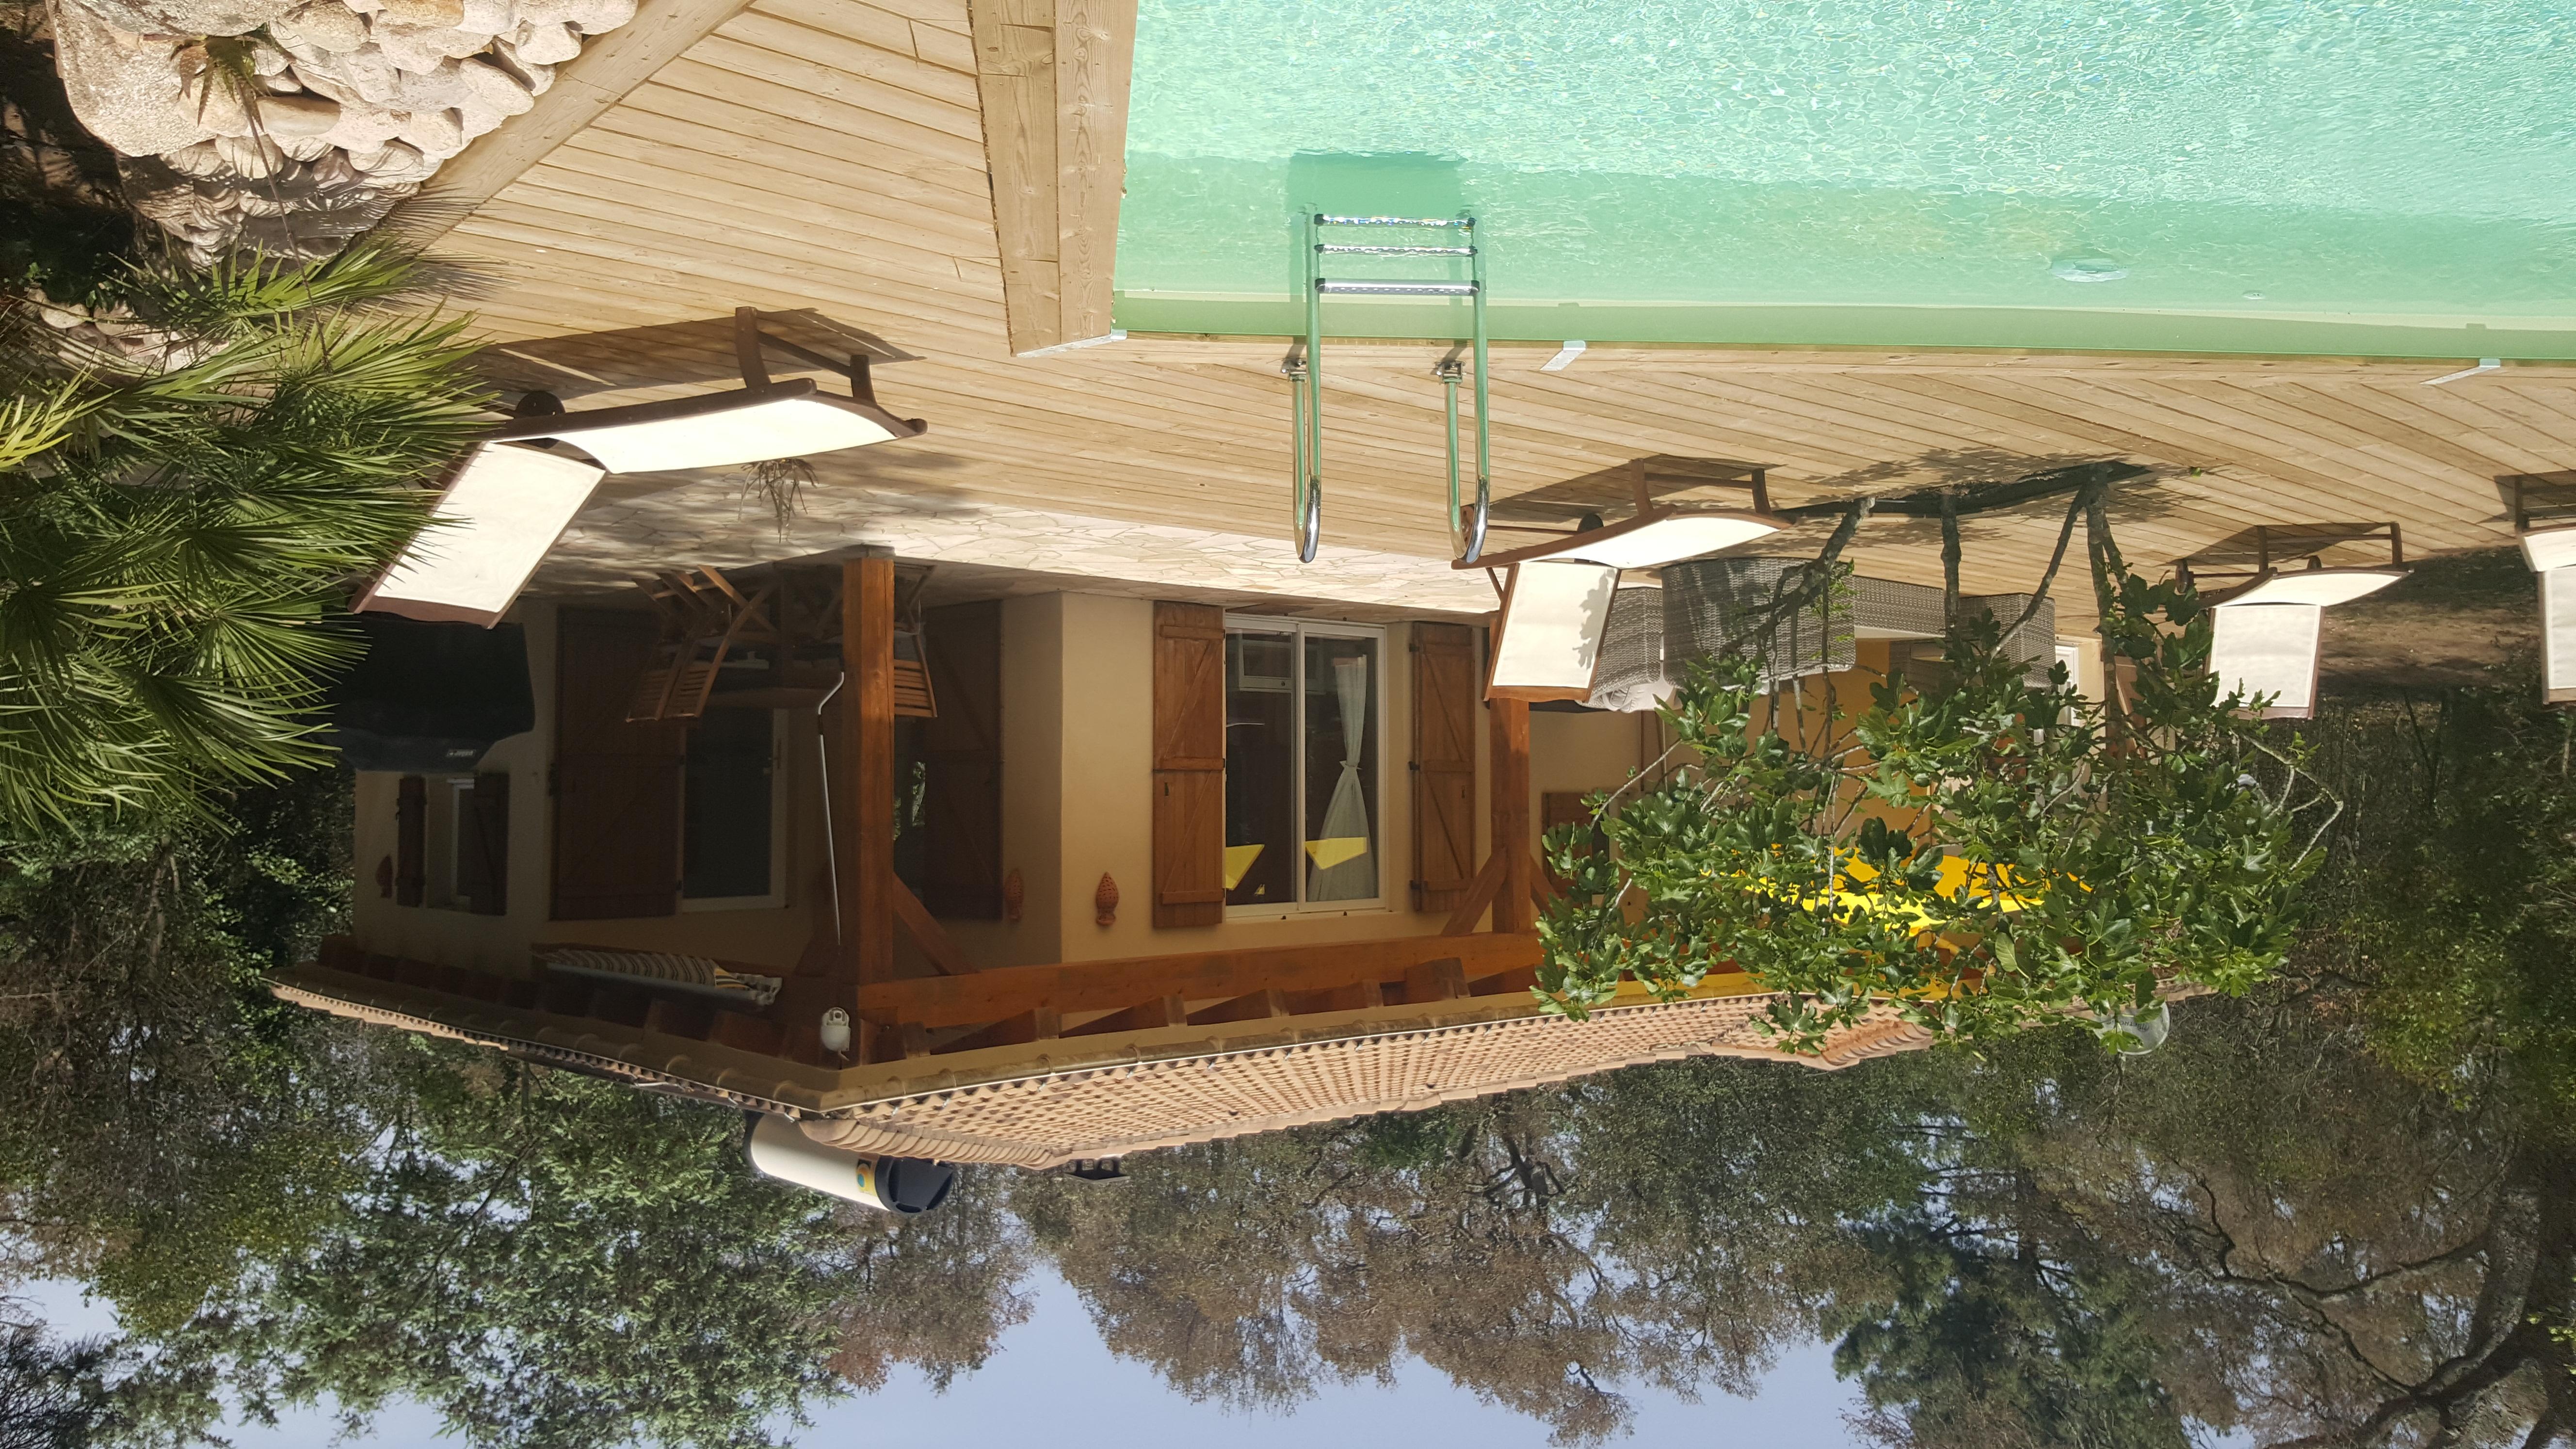 Ferienhaus, Korsika, Pool, Garten